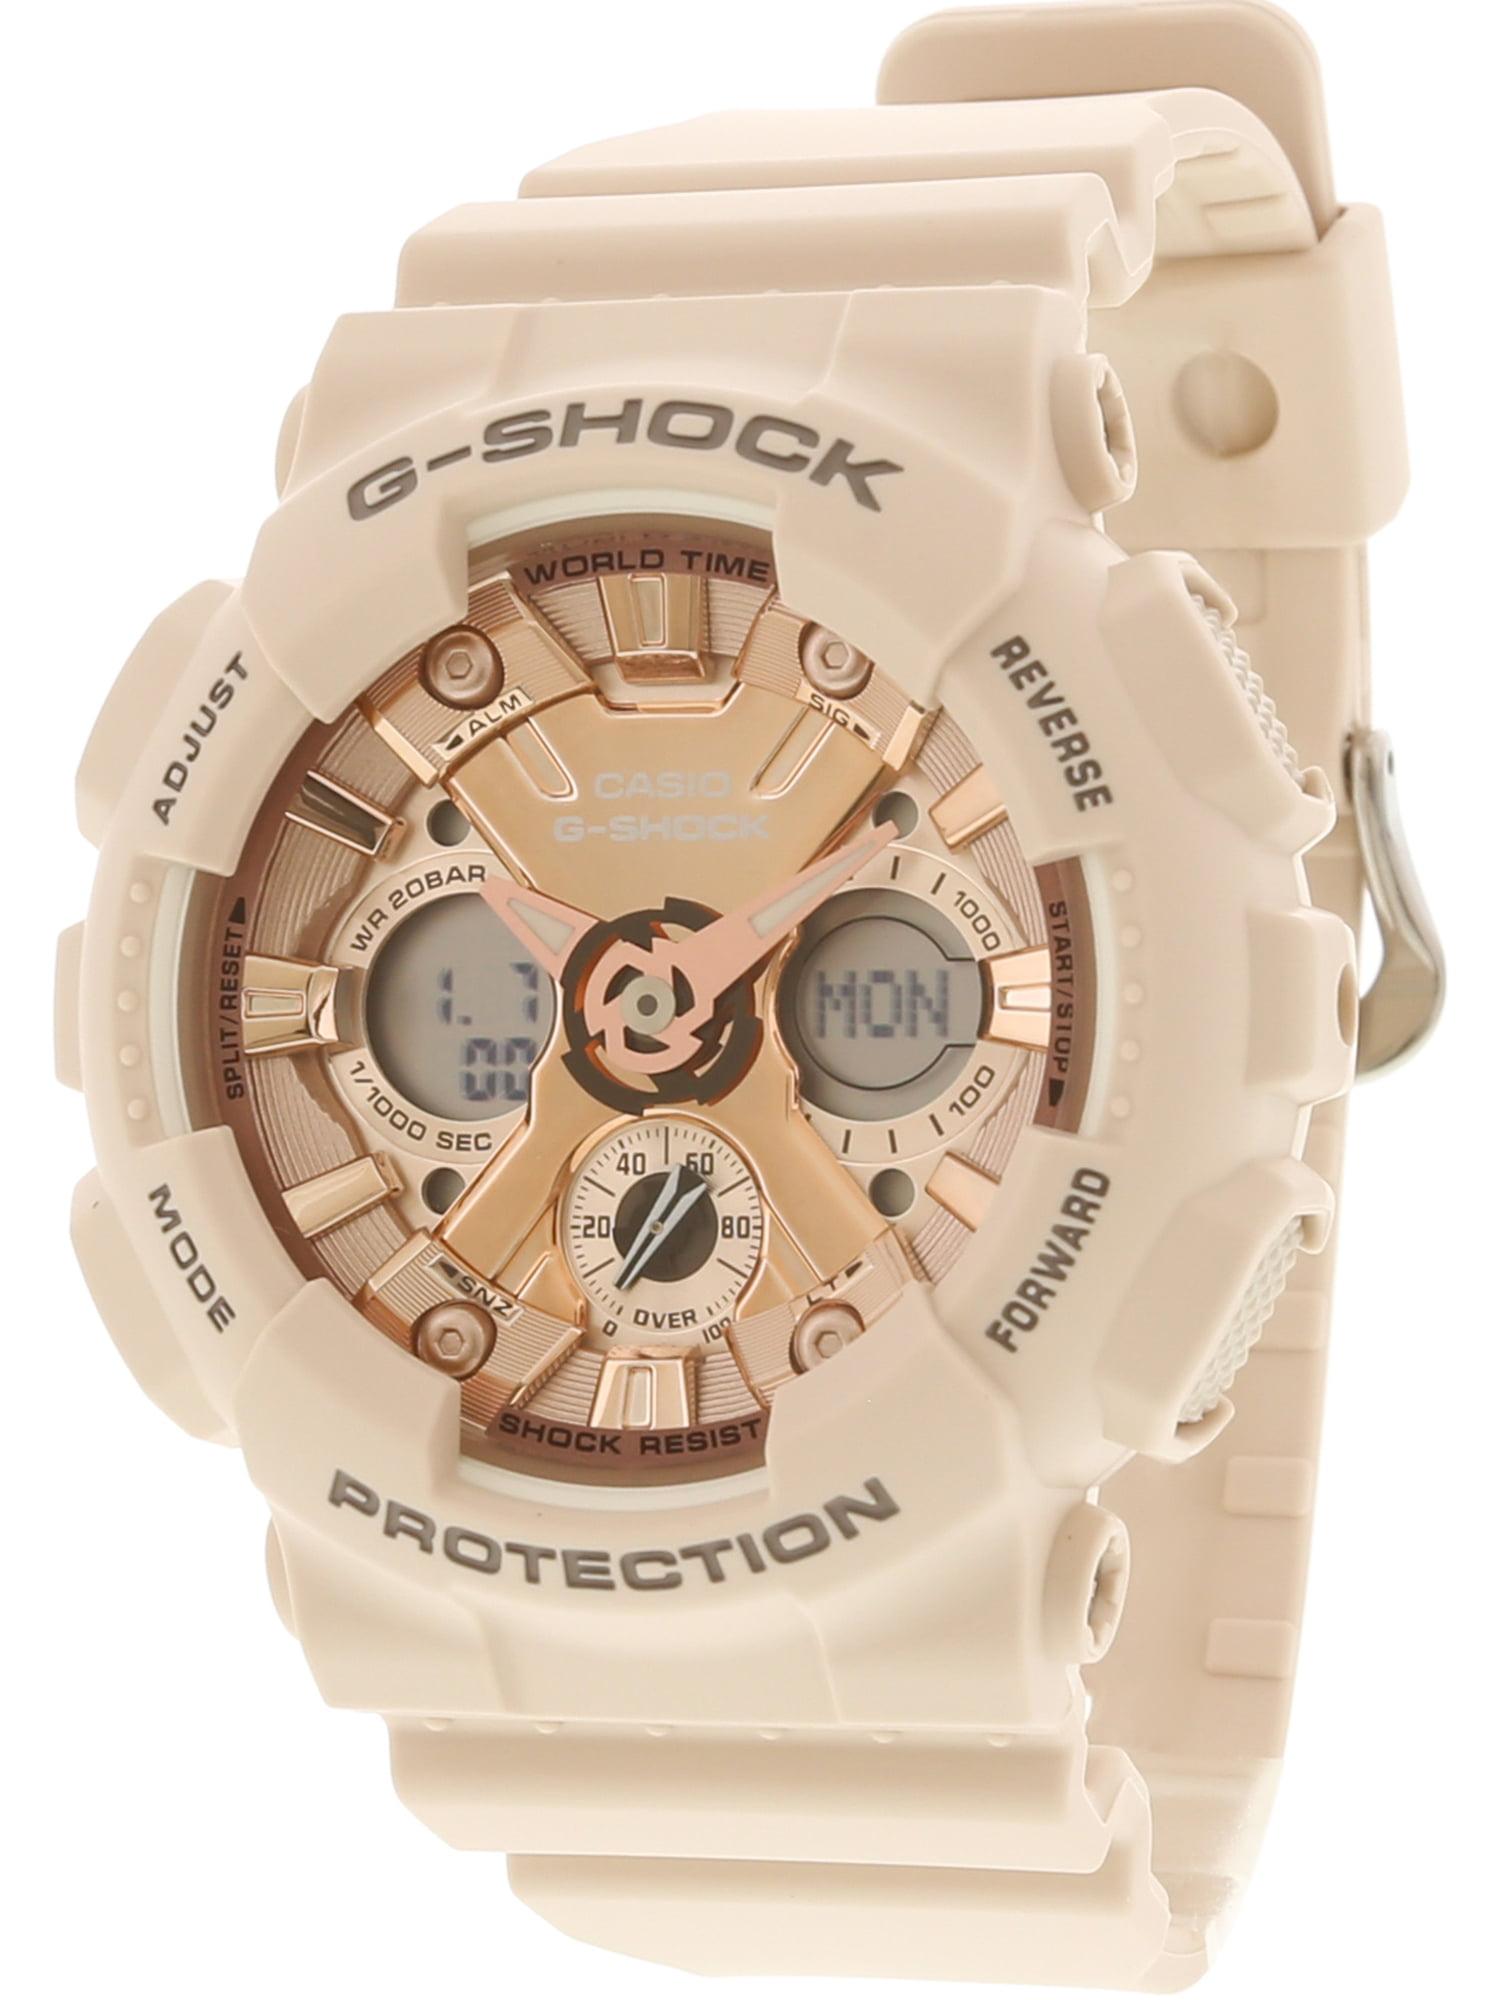 GMAS120MF-4A G-Shock Analog Digital Rose Gold Peach Resin Watch